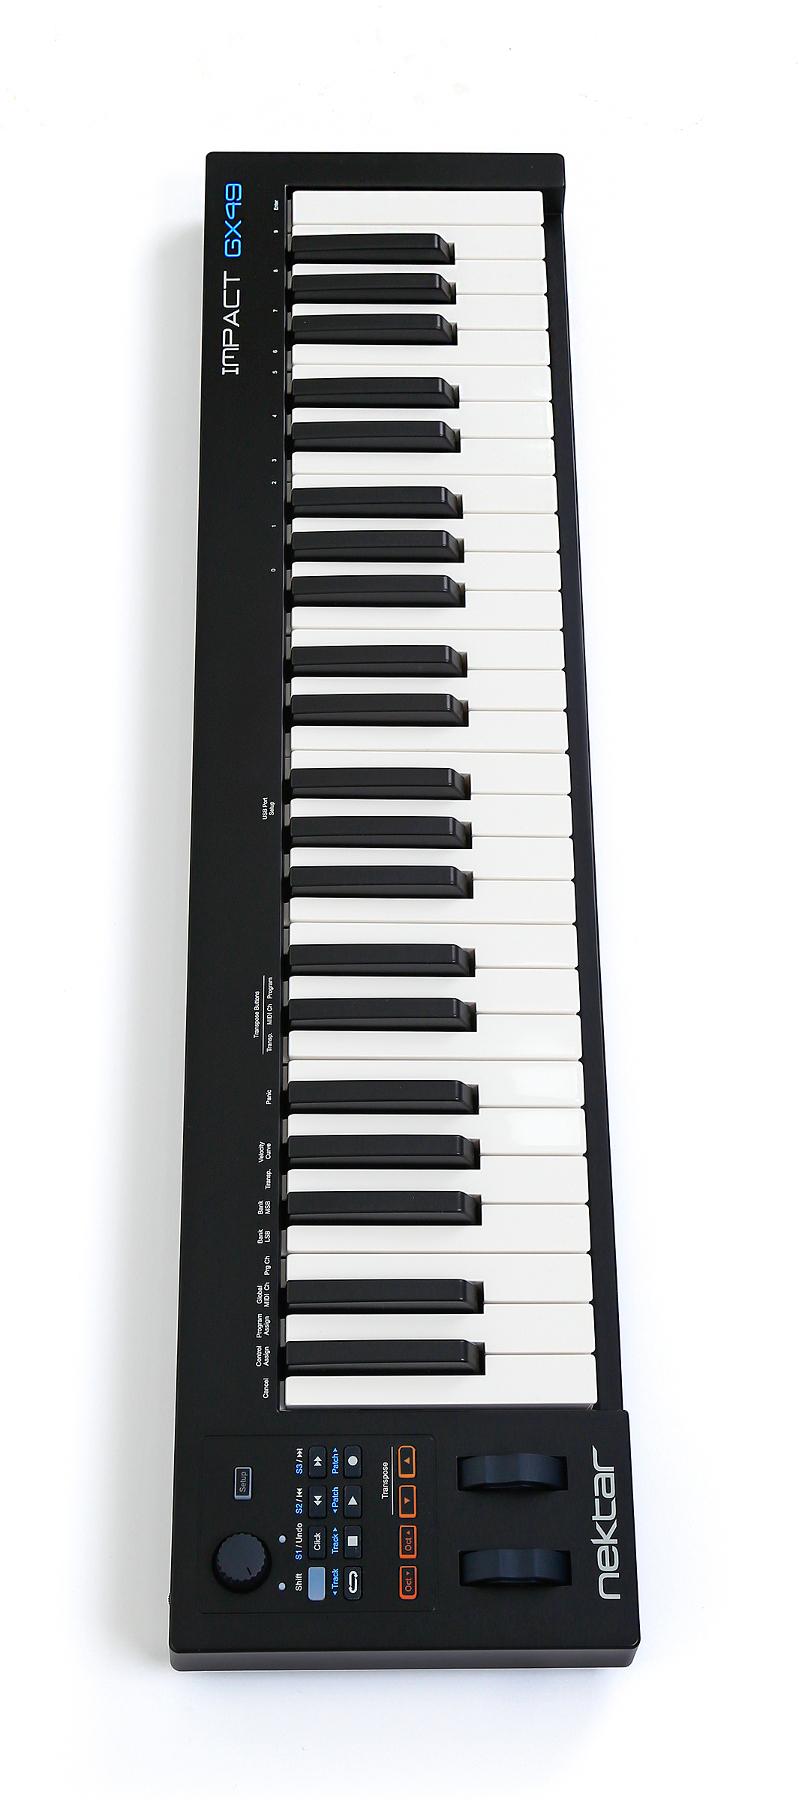 49-Key USB MIDI Controller with DAW Integration